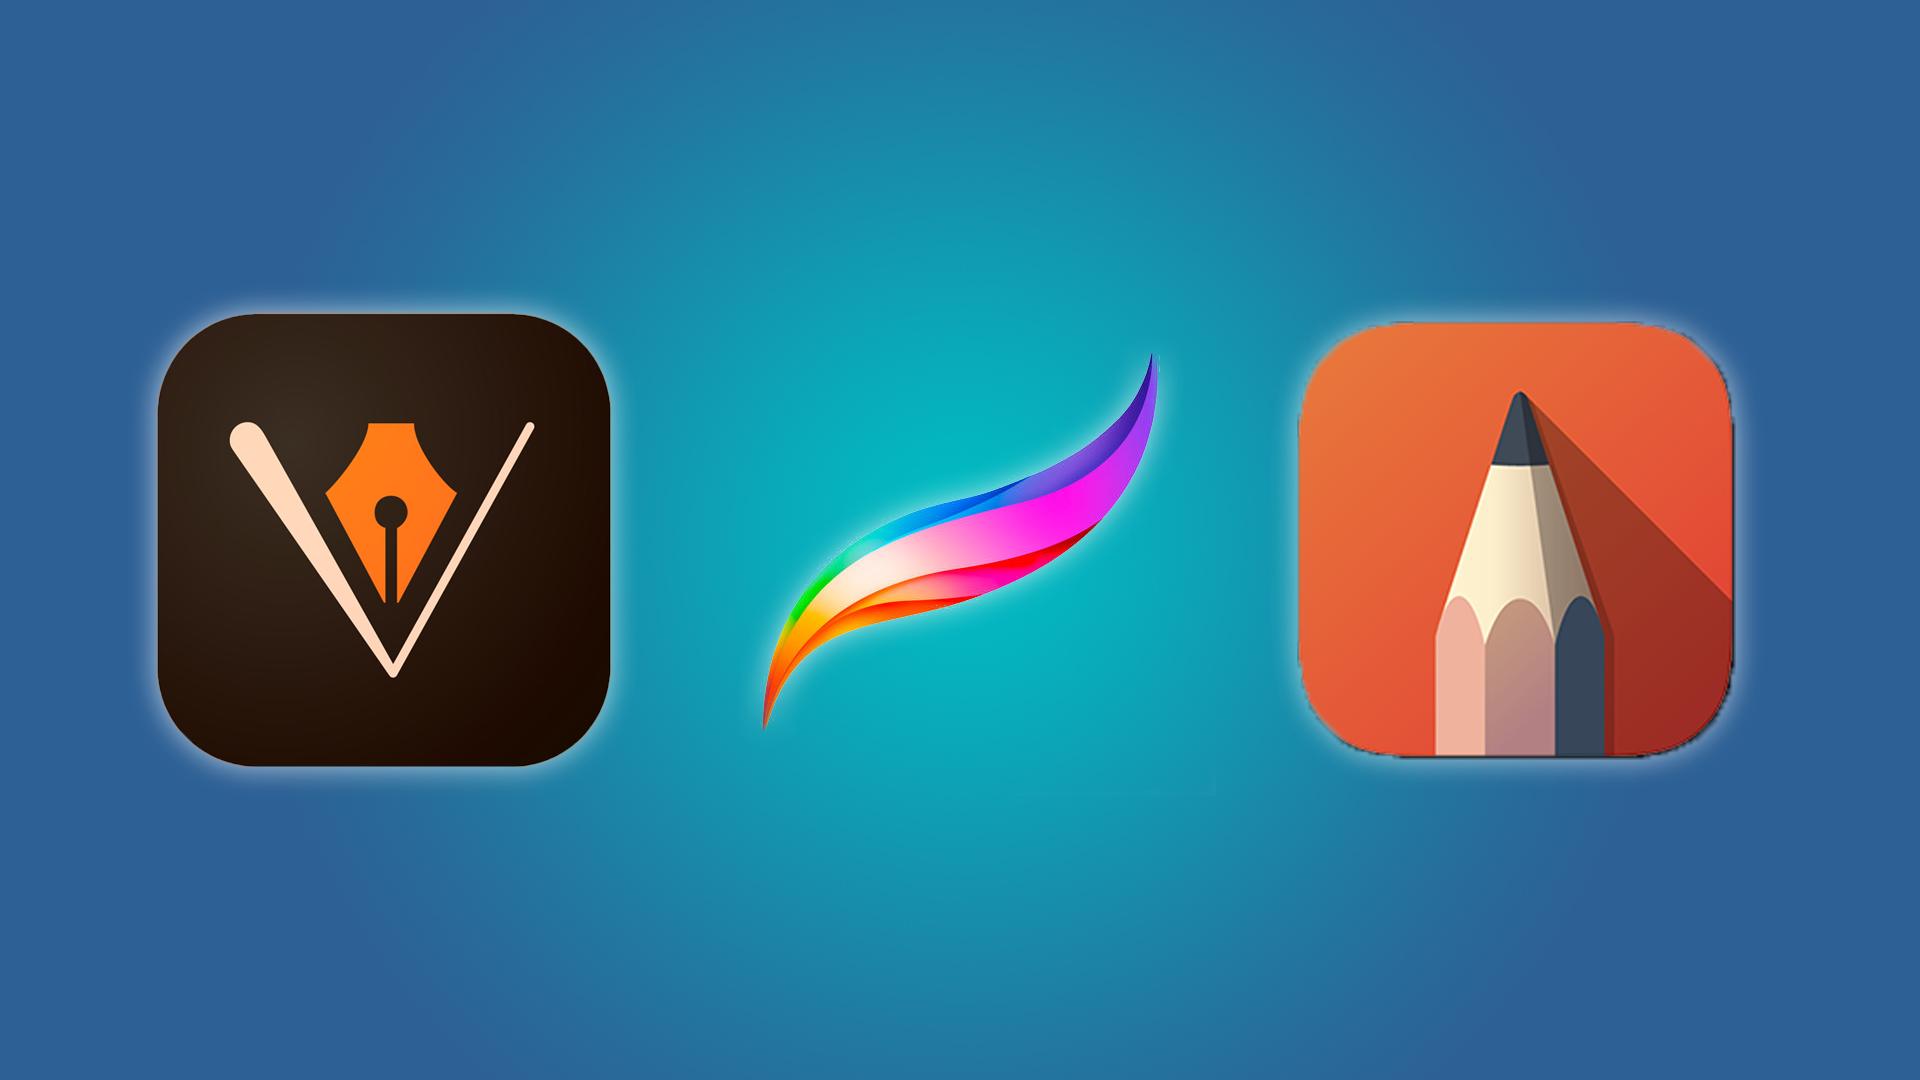 Adobe Illustrator, Procreate, and Autodesk Sketchbook